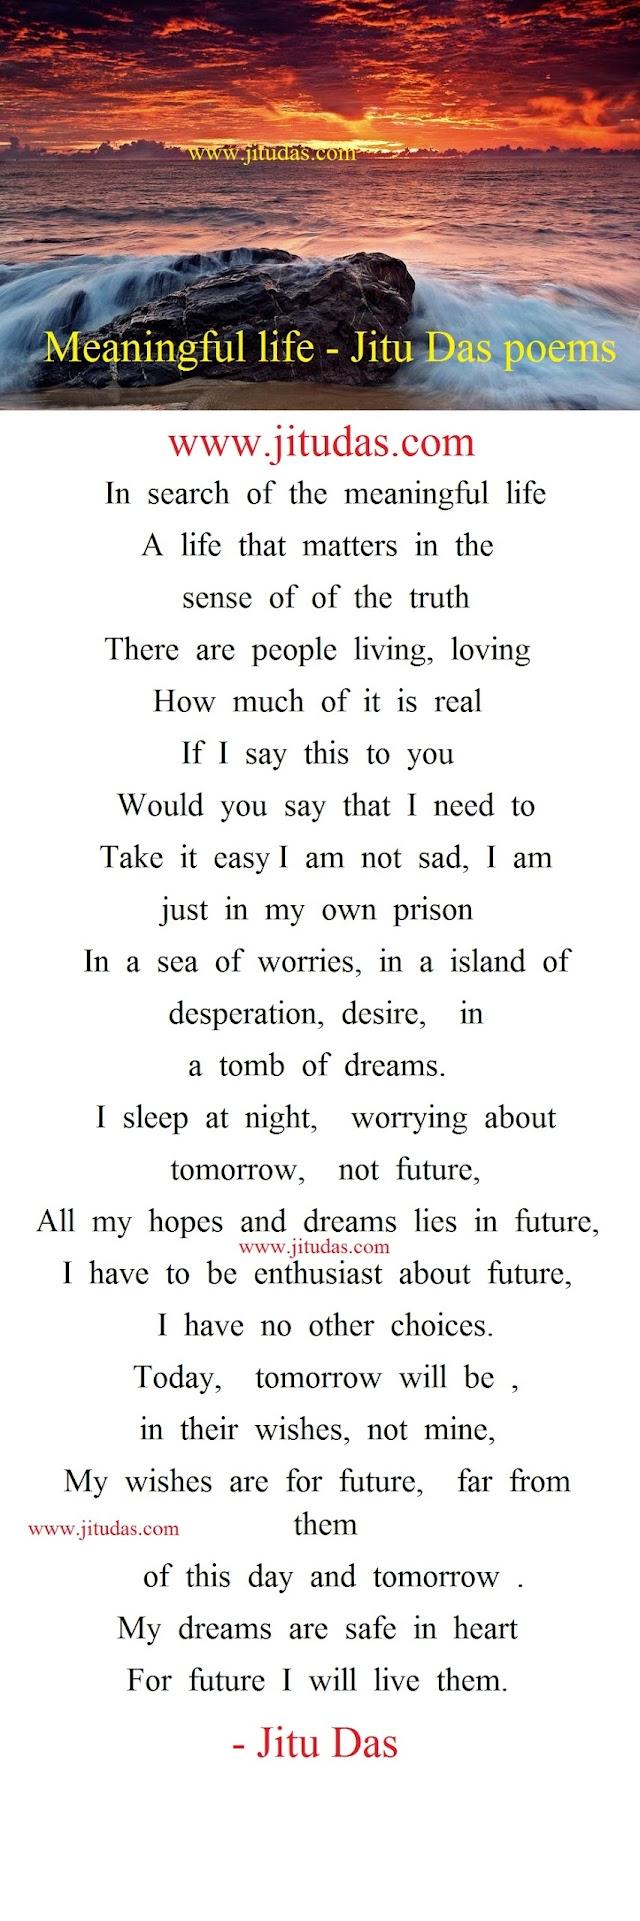 Deep life poem, Meaningful life by Jitu Das english poems